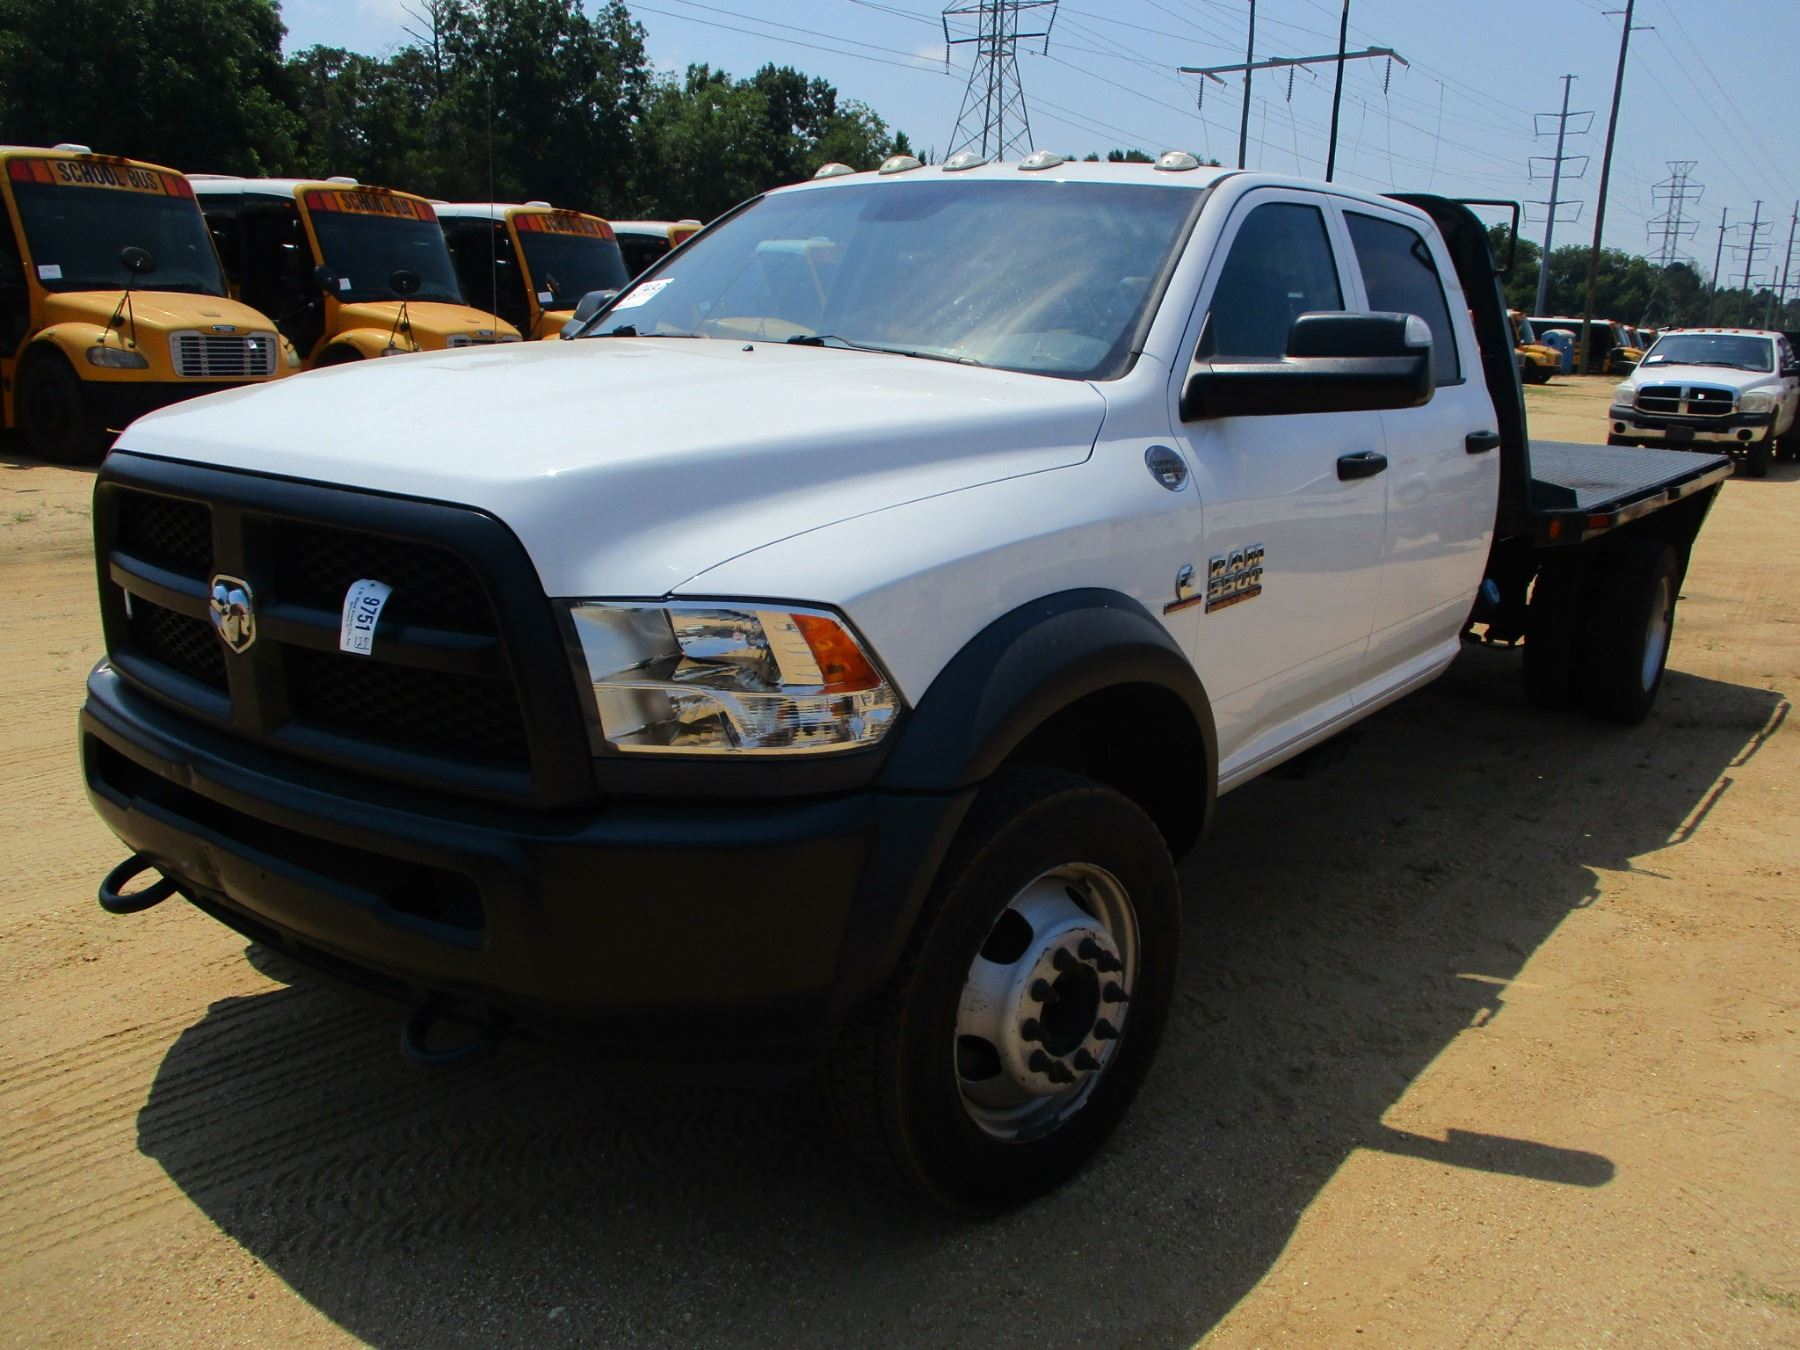 2015 Dodge Ram 5500 Flatbed Truck Vin Sn 3c7wrnfl3fg588904 4x4 Crew Cab Cummins Turbo Diesel En